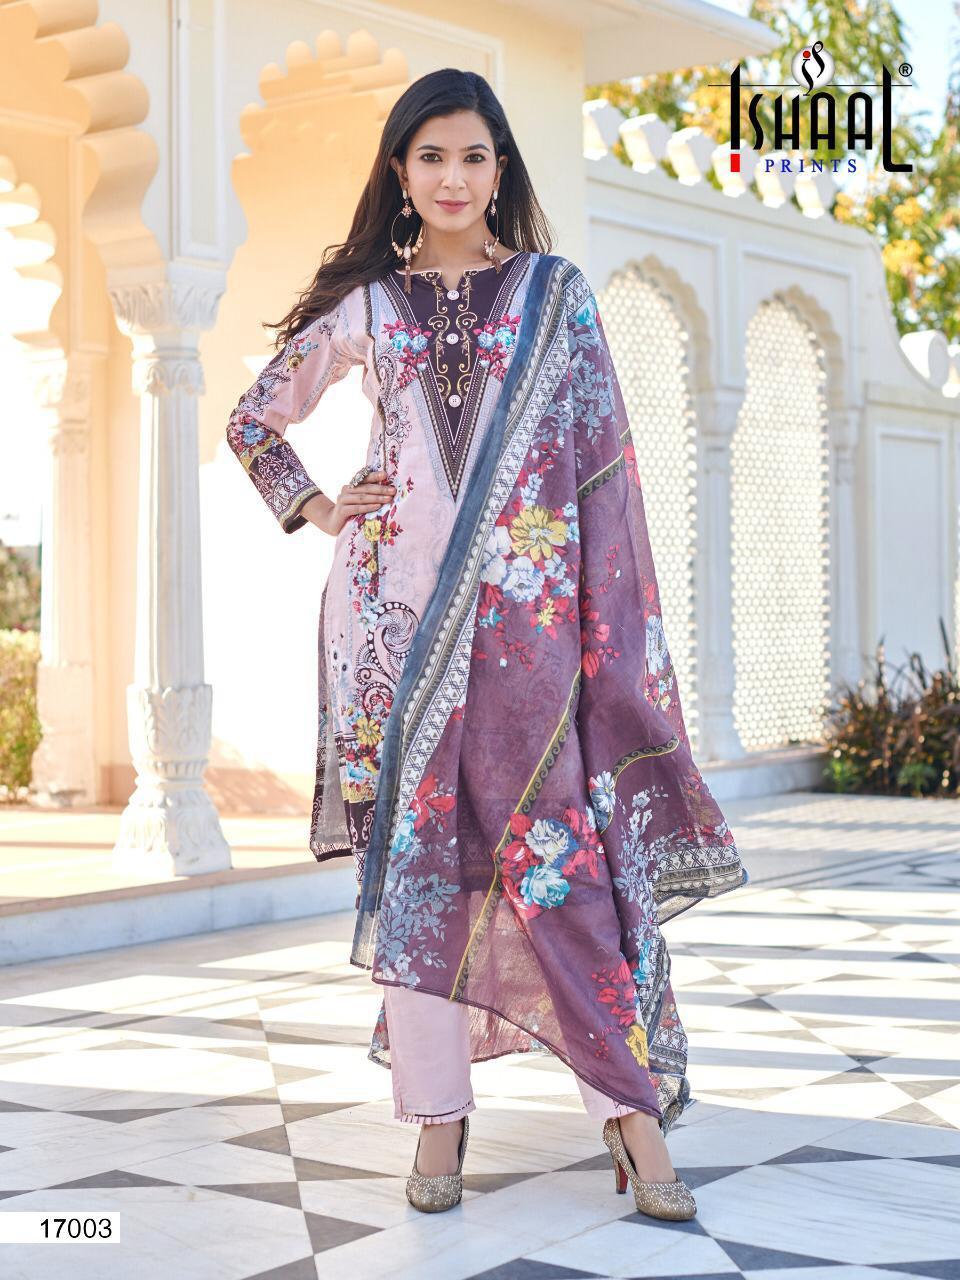 Ishaal Gulmohar Vol 17 Salwar Suit Wholesale Catalog 10 Pcs 10 - Ishaal Gulmohar Vol 17 Salwar Suit Wholesale Catalog 10 Pcs